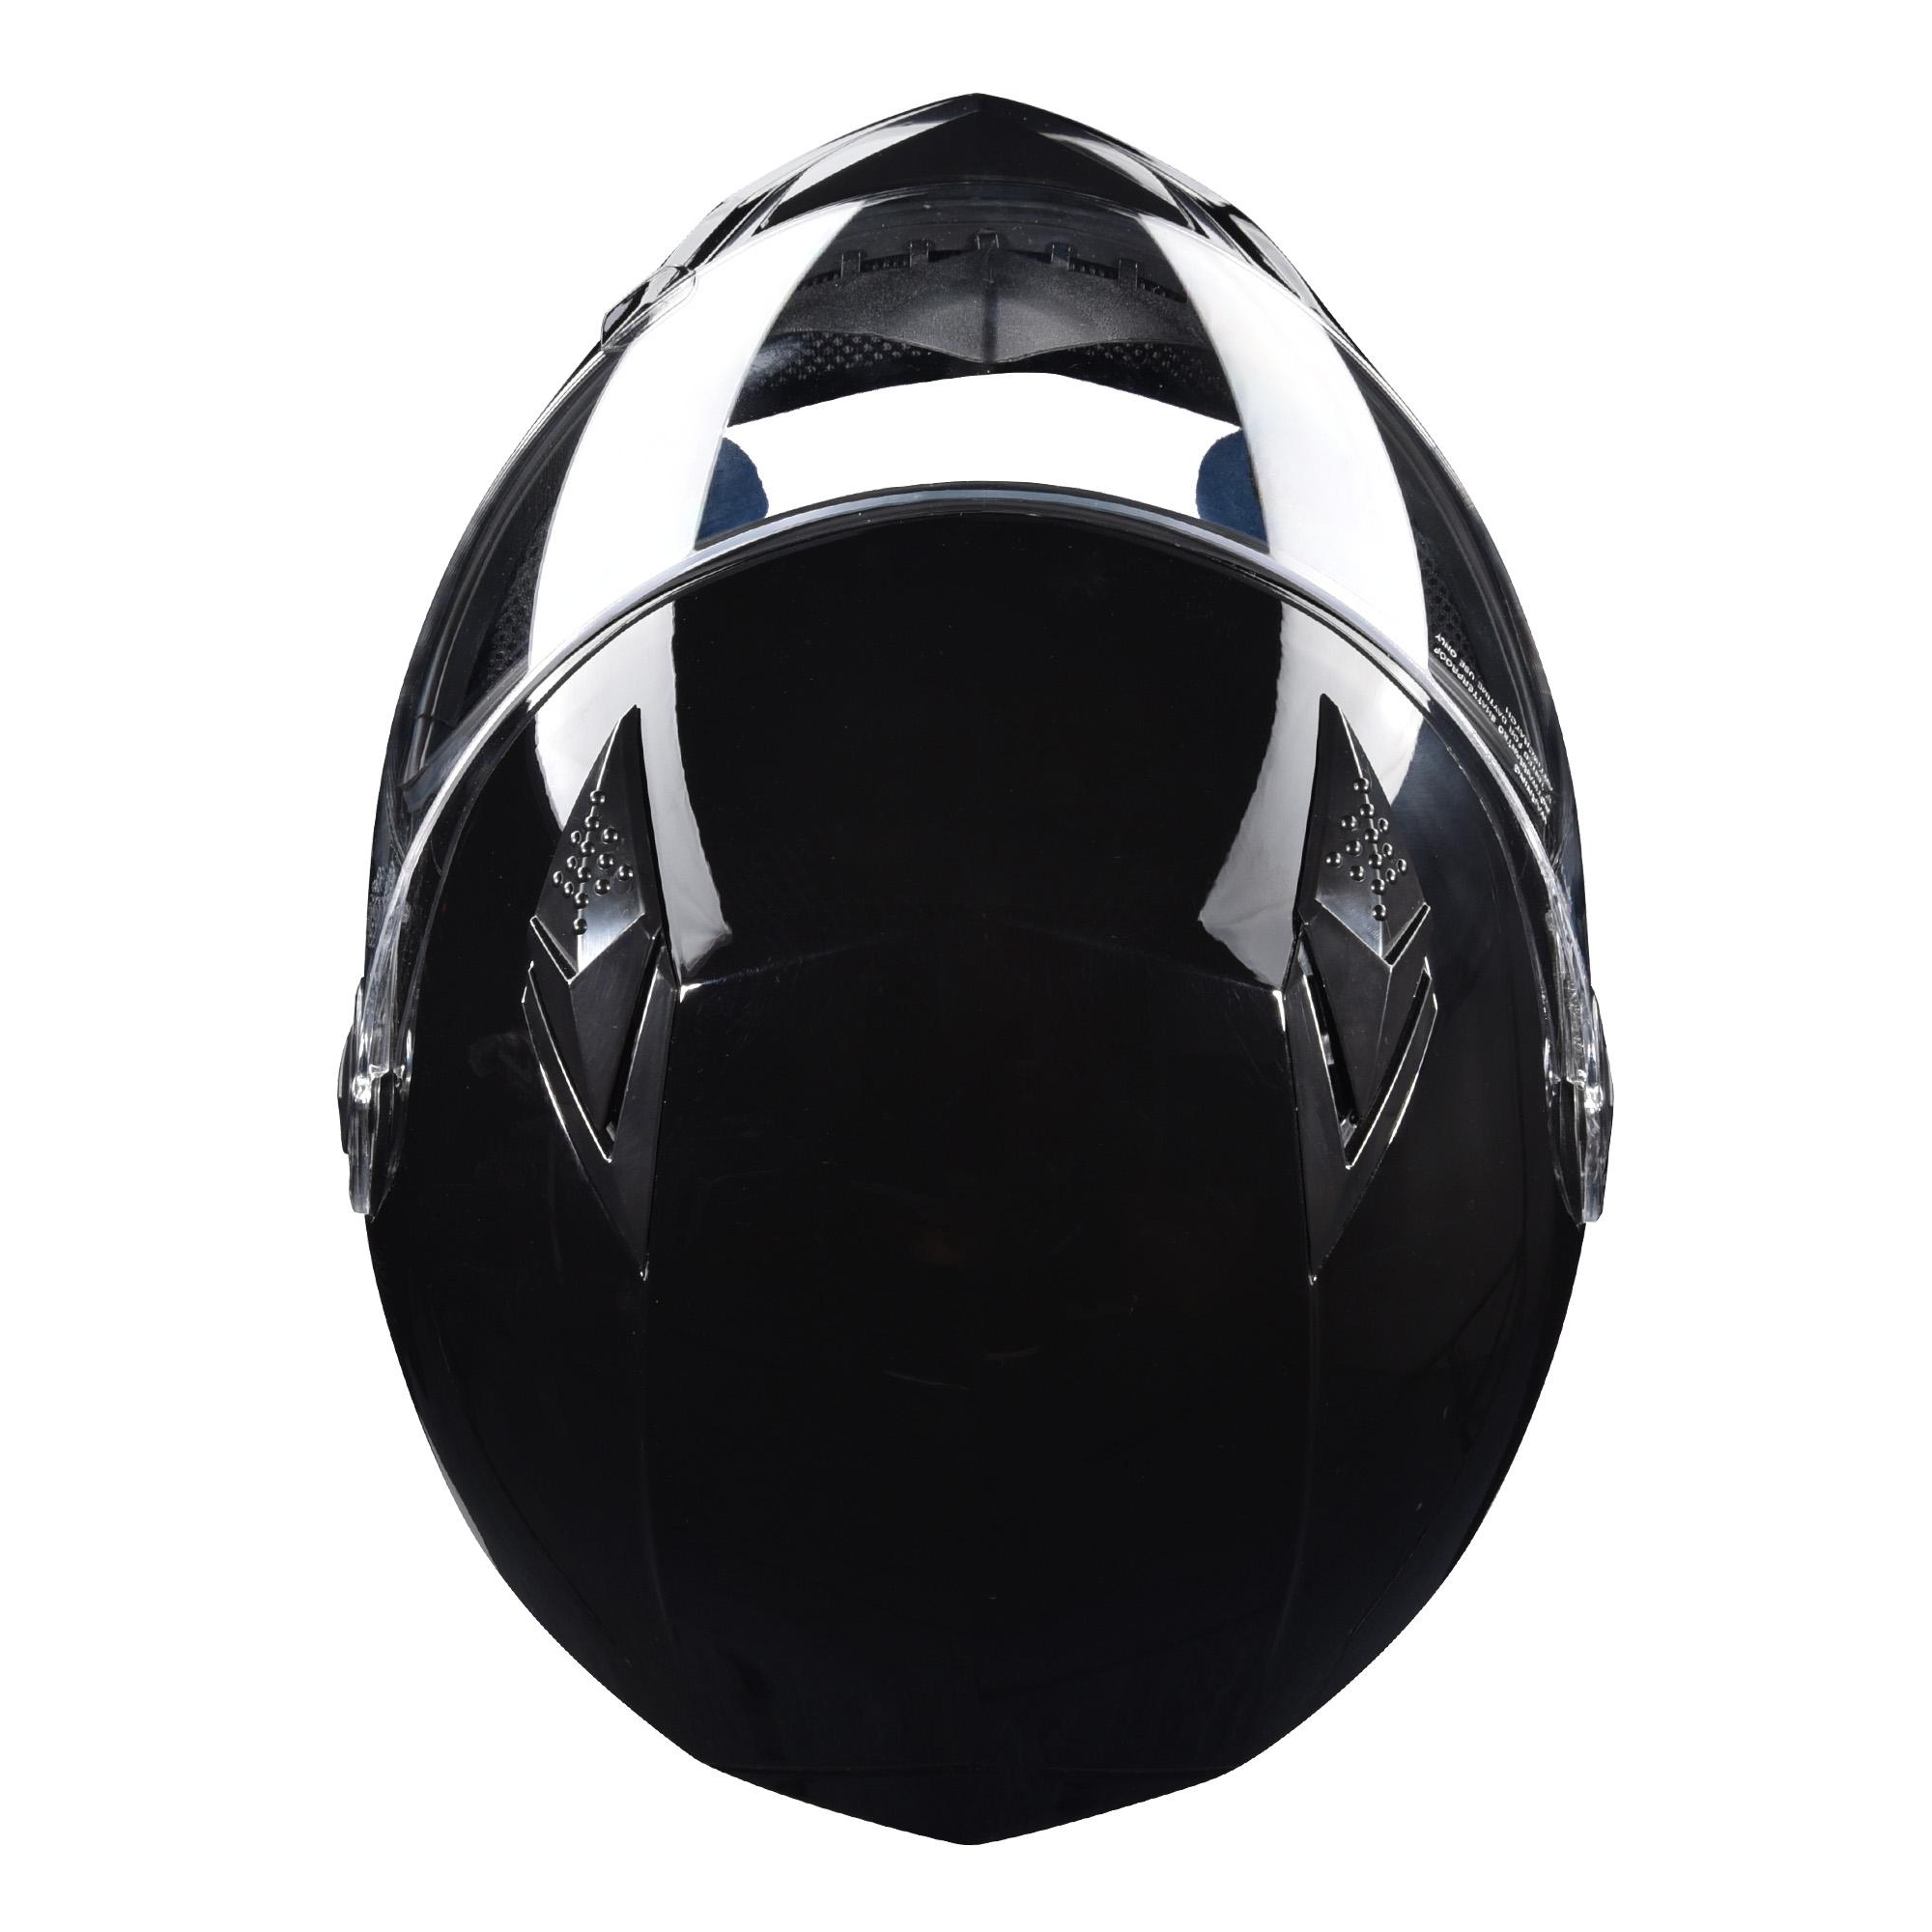 miniature 19 - AHR K12 Full Face Motorcycle Helmet DOT Air Vents Clear Visor Racing S M L XL